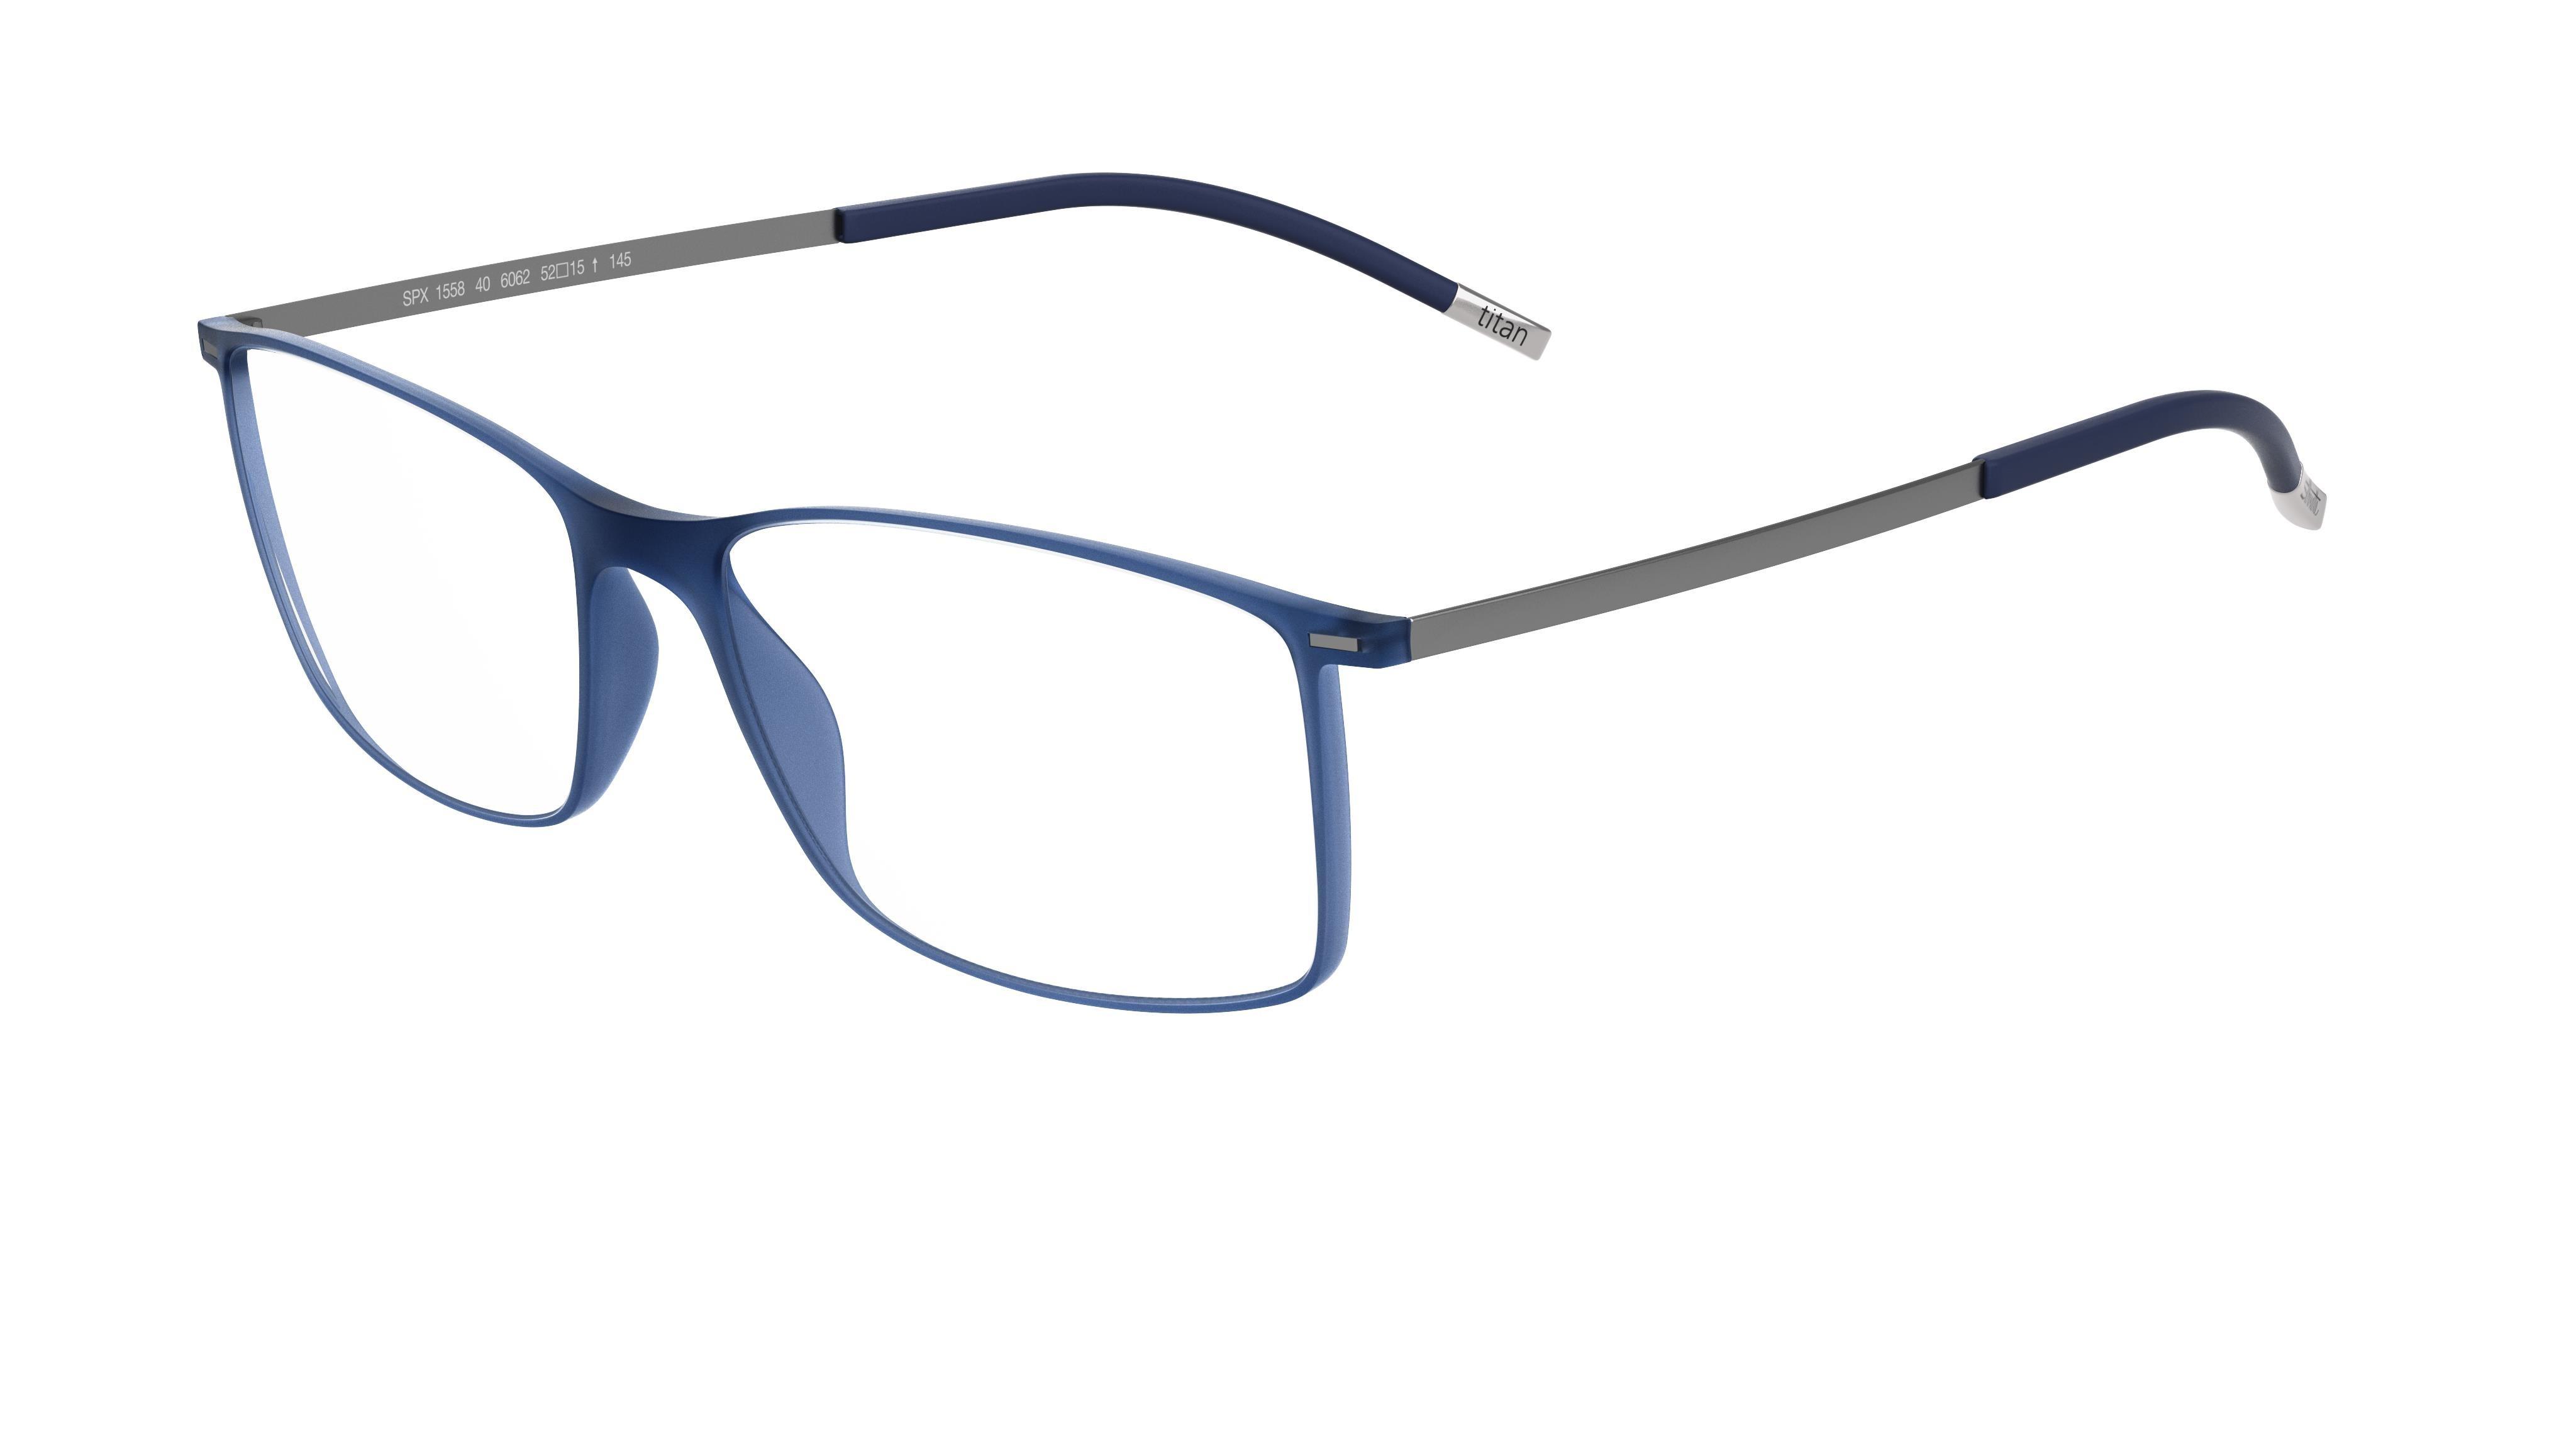 8c81a2144451d Silhouette Urban Lite 2902 6055 - Óculos de Grau